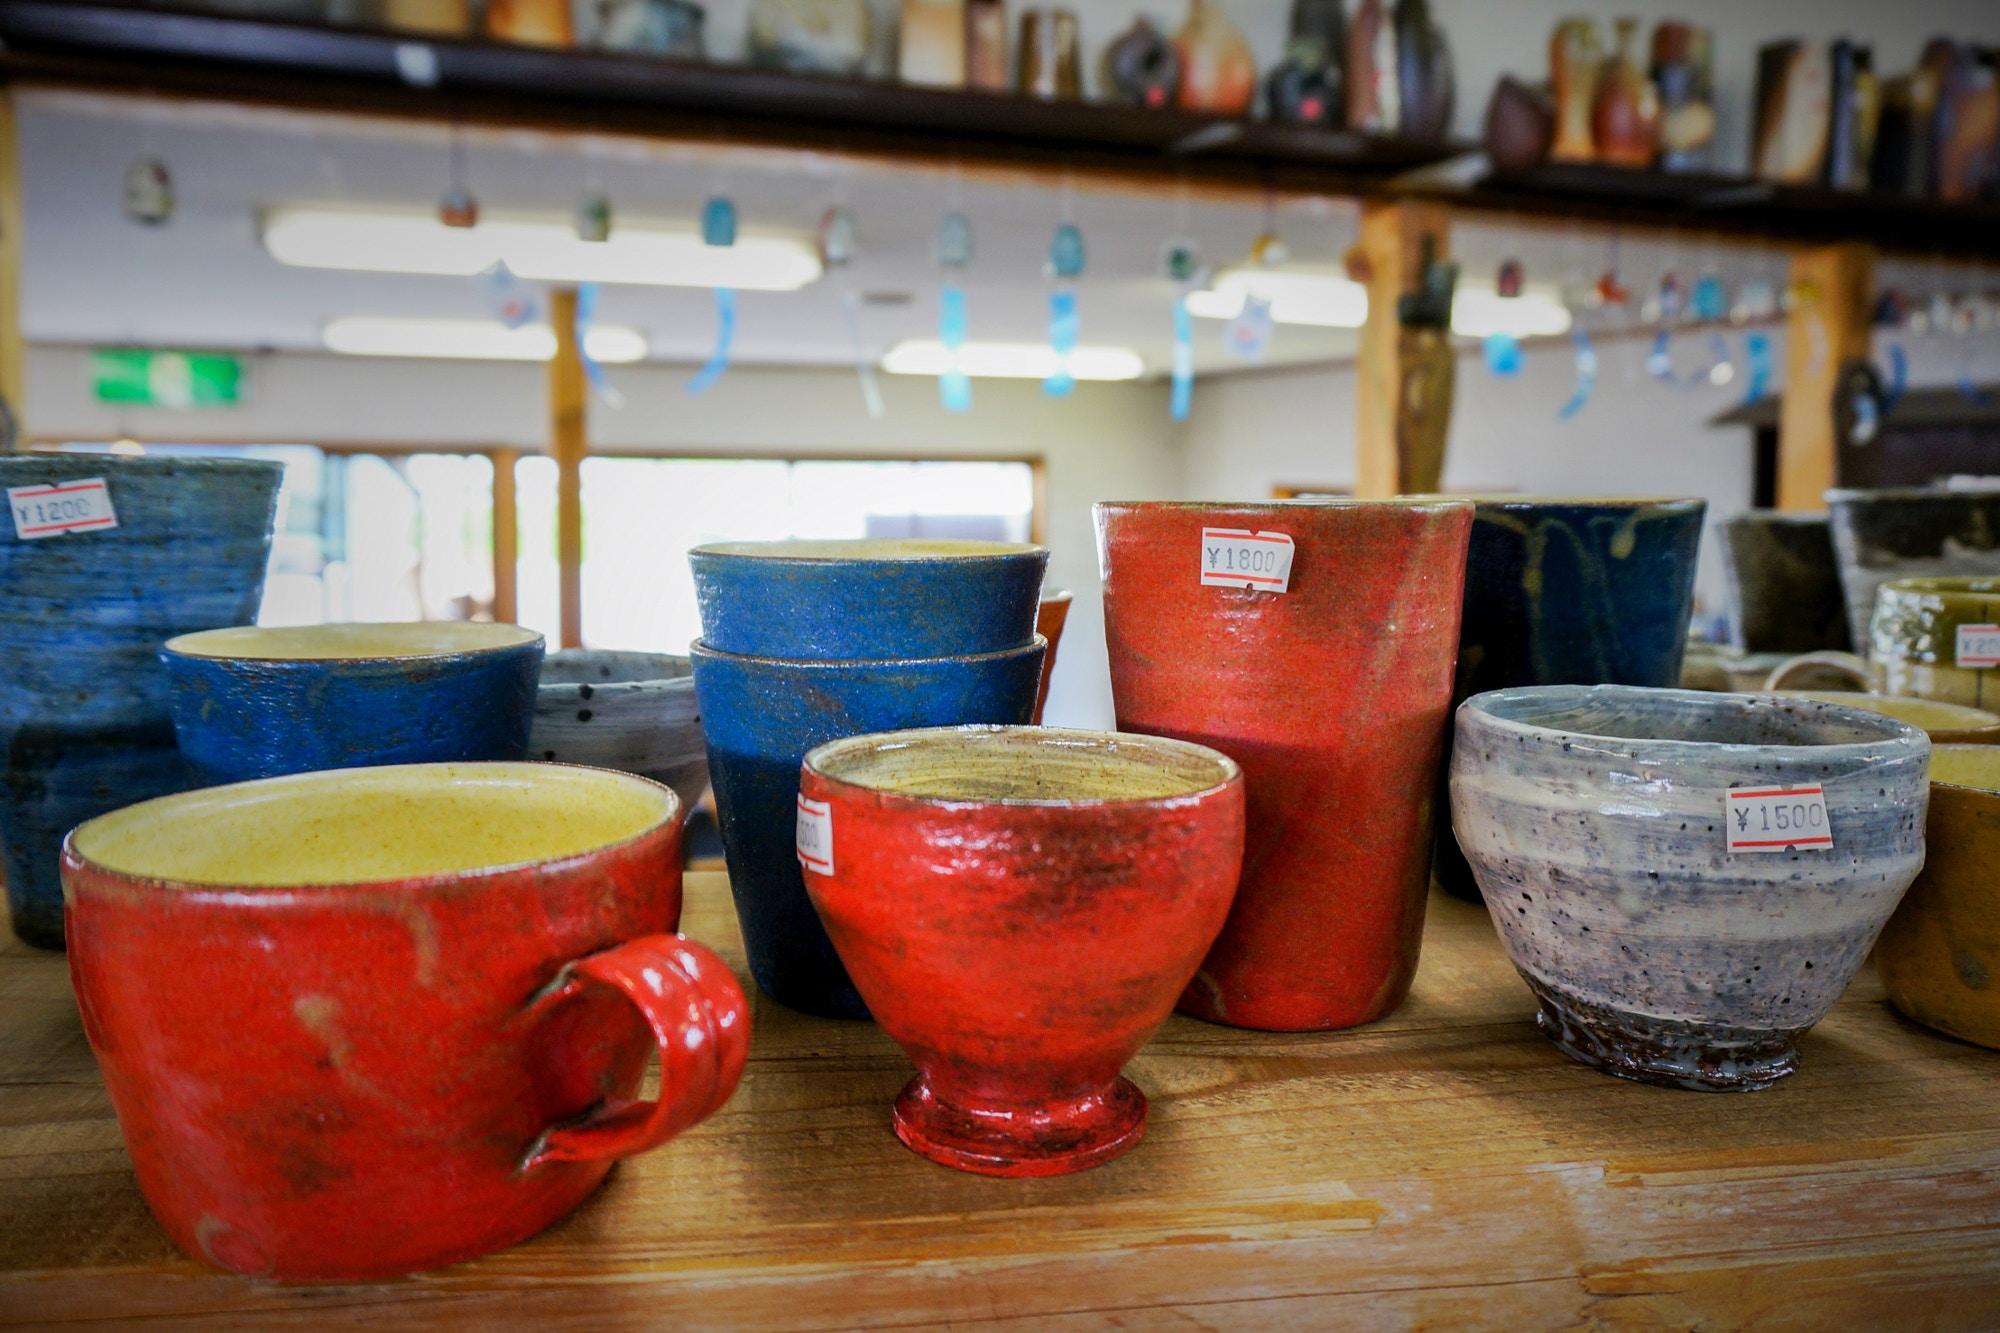 Pottery on sale in the village of Shigaraki